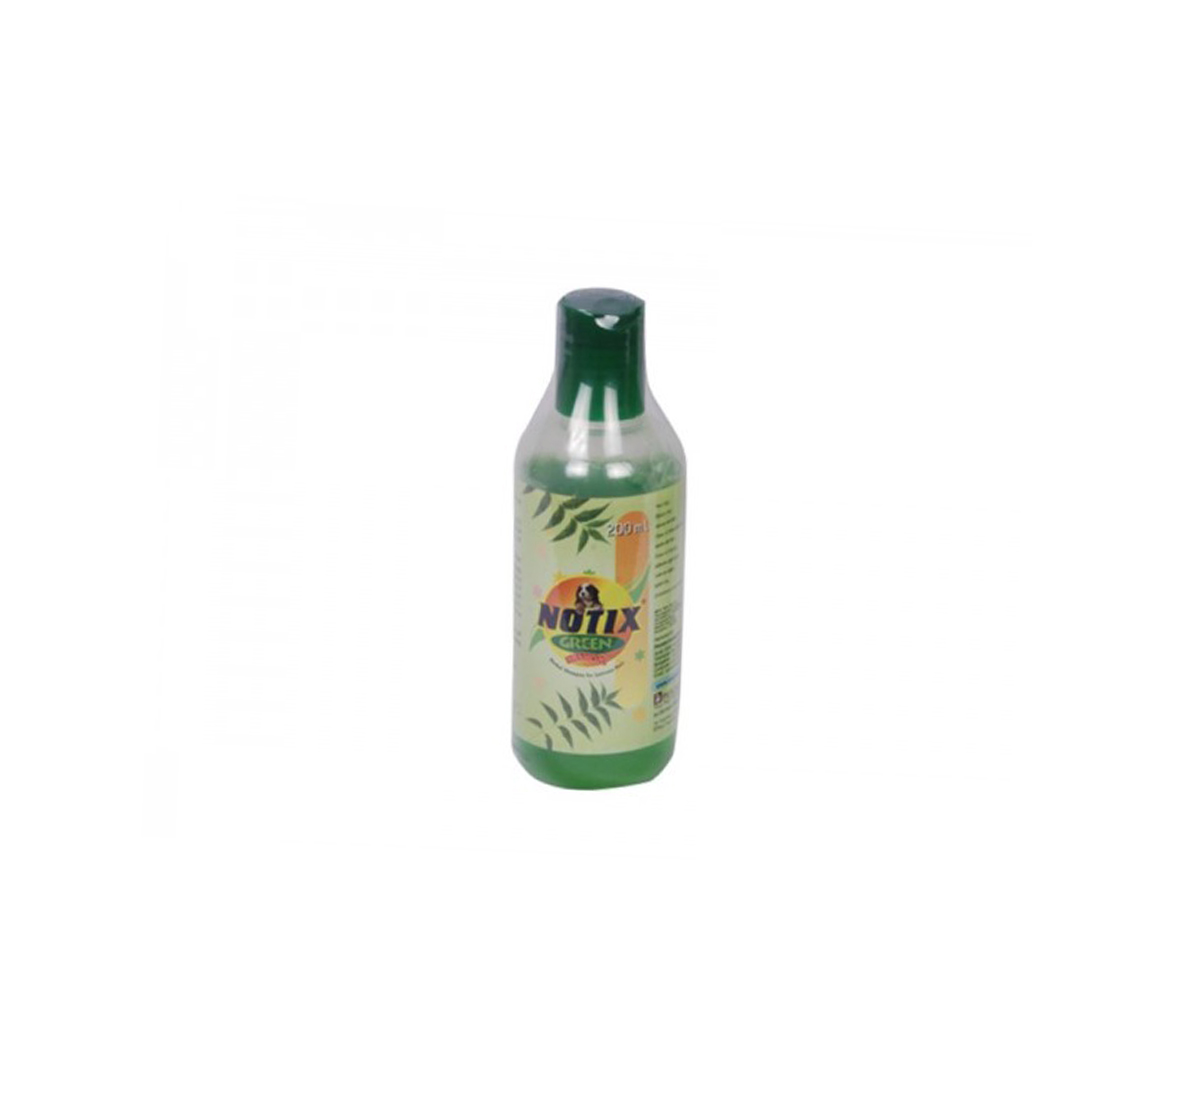 Notix Green Shampoo For Dog - 500 ml